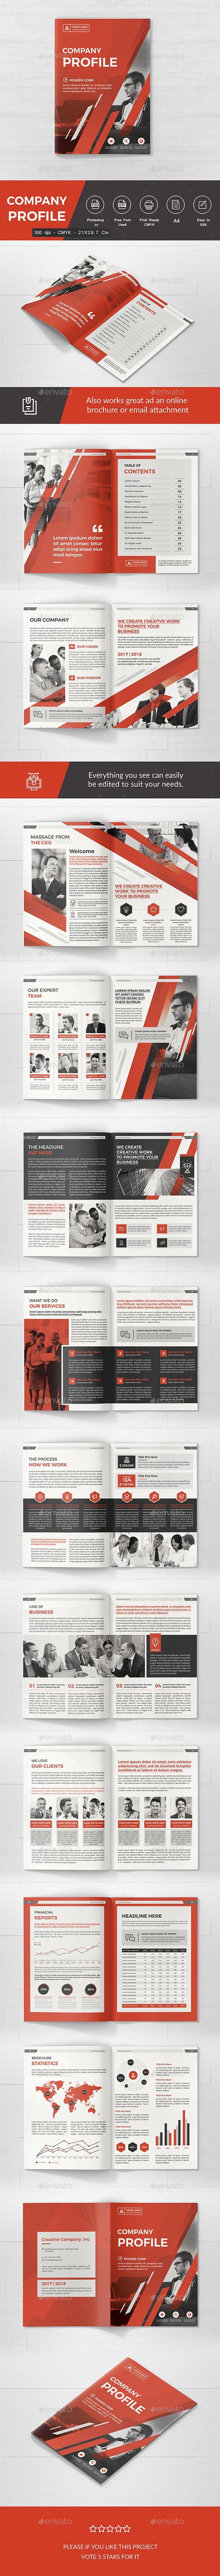 #Company #Profile - Corporate #Brochures Download here: https://graphicriver.net/item/company-profile/19586040?ref=alena994